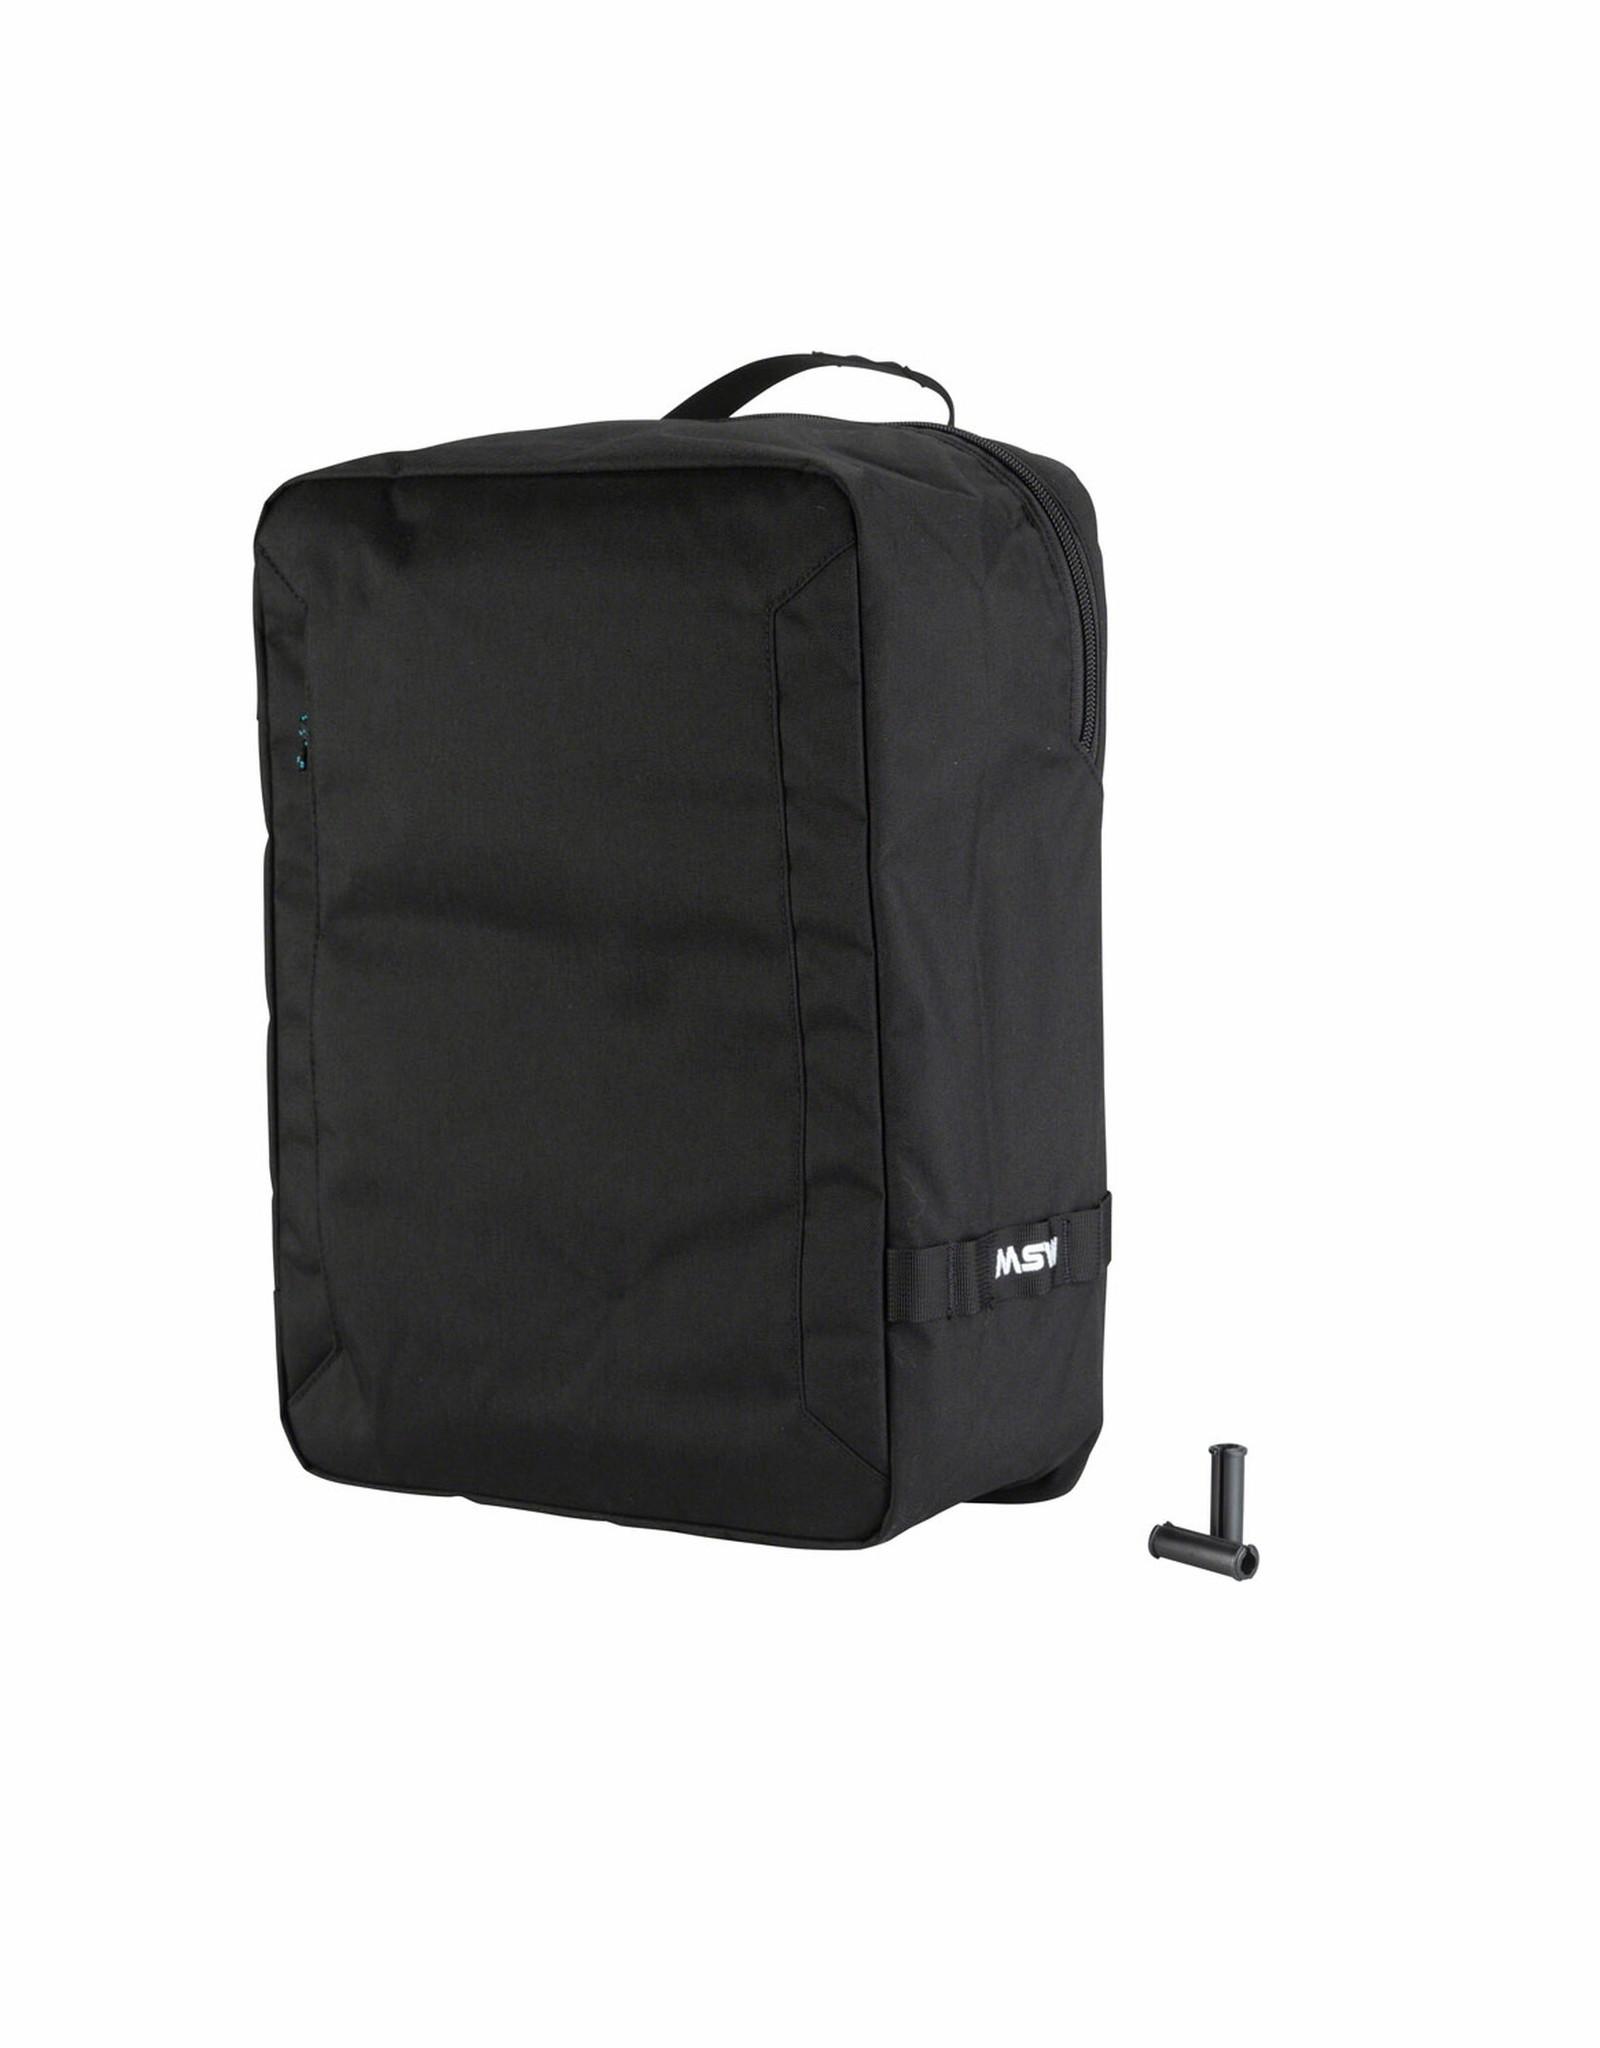 MSW Blacktop Pannier Bag Black Single